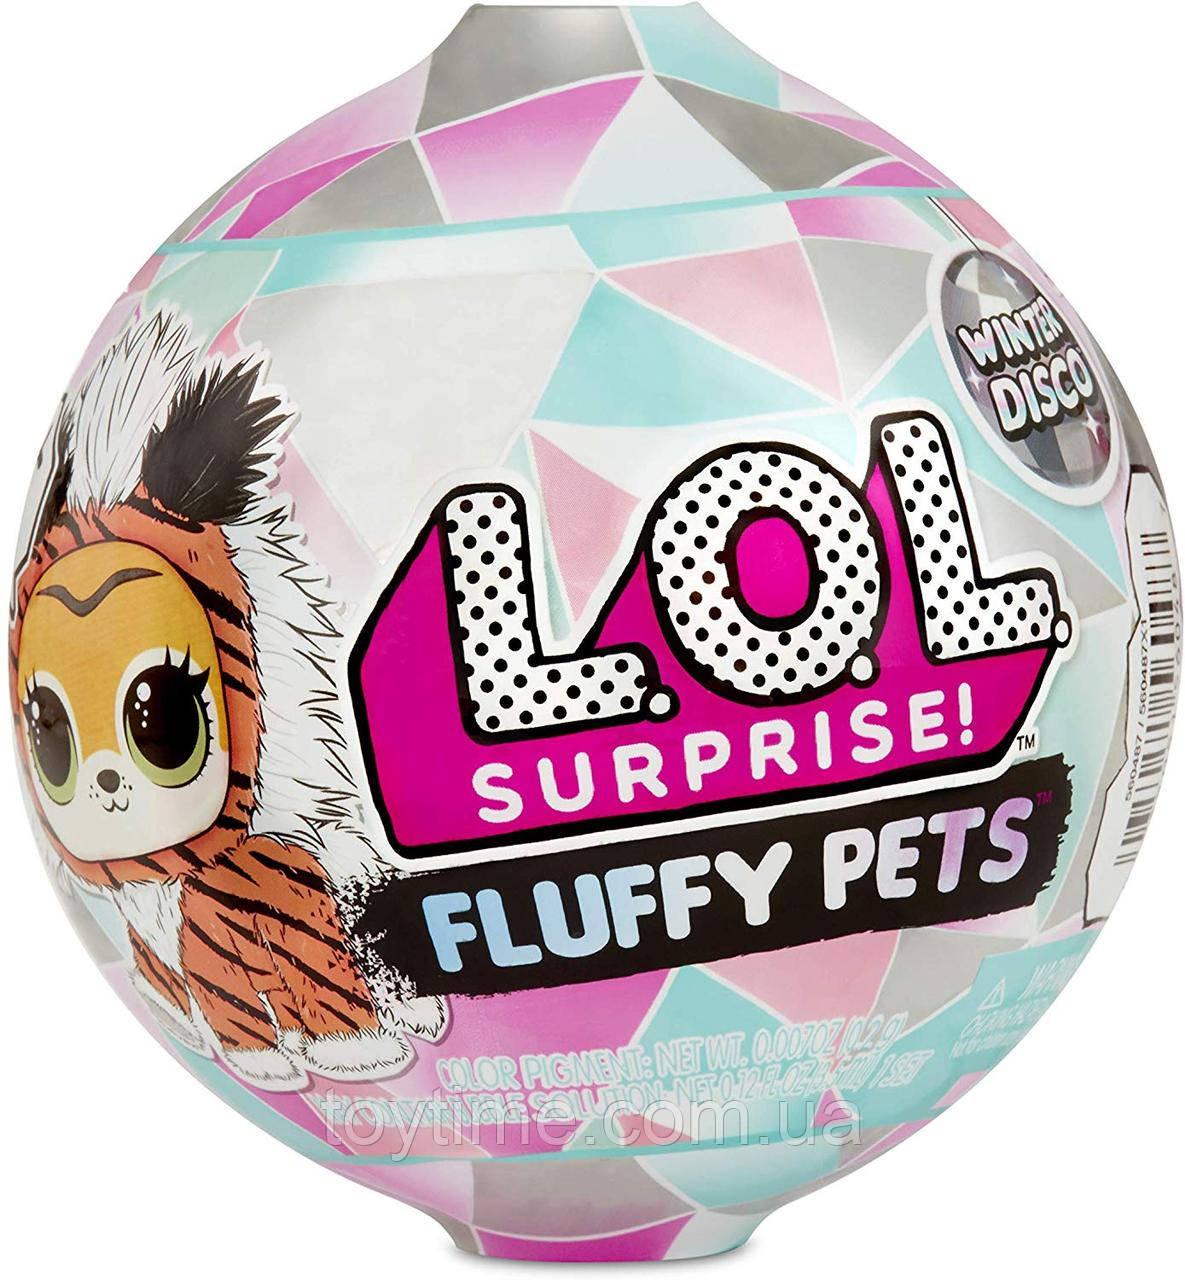 ЛОЛ Зимнее Диско Пушистый любимец / L.O.L. Surprise! Fluffy Pets Winter Disco Series with Removable Fur